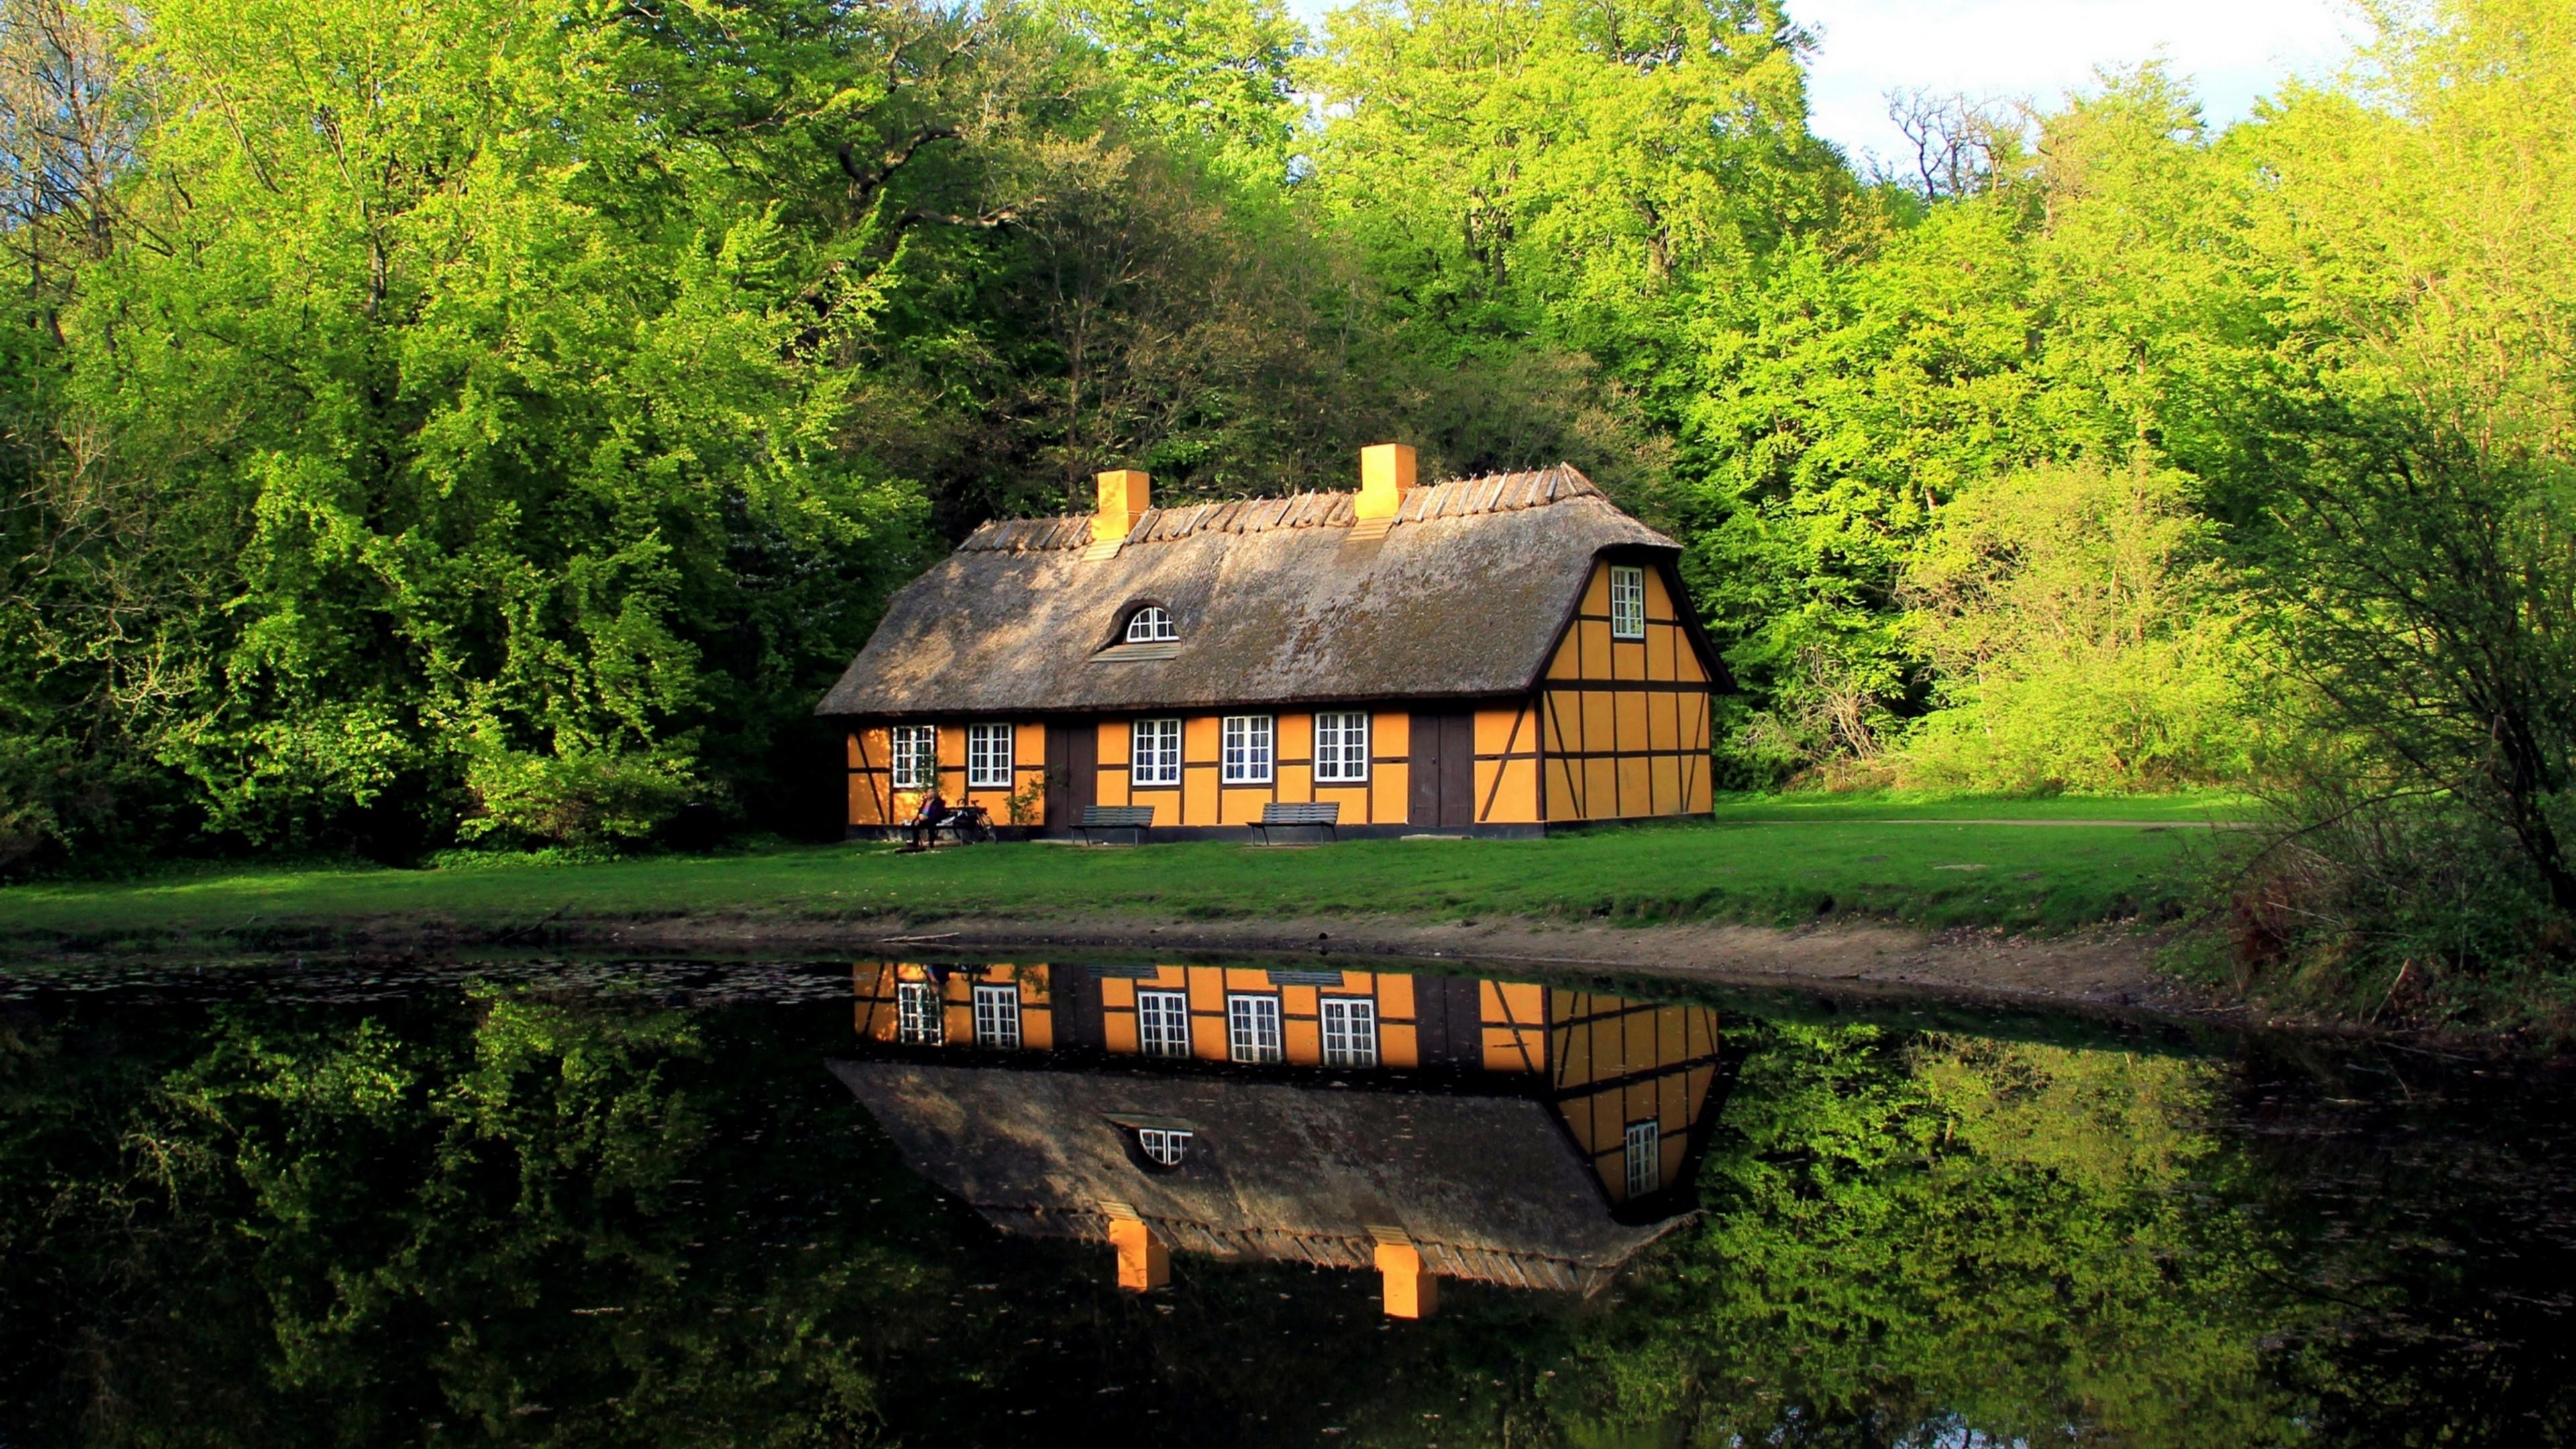 Cozy house next to a pond wallpaper